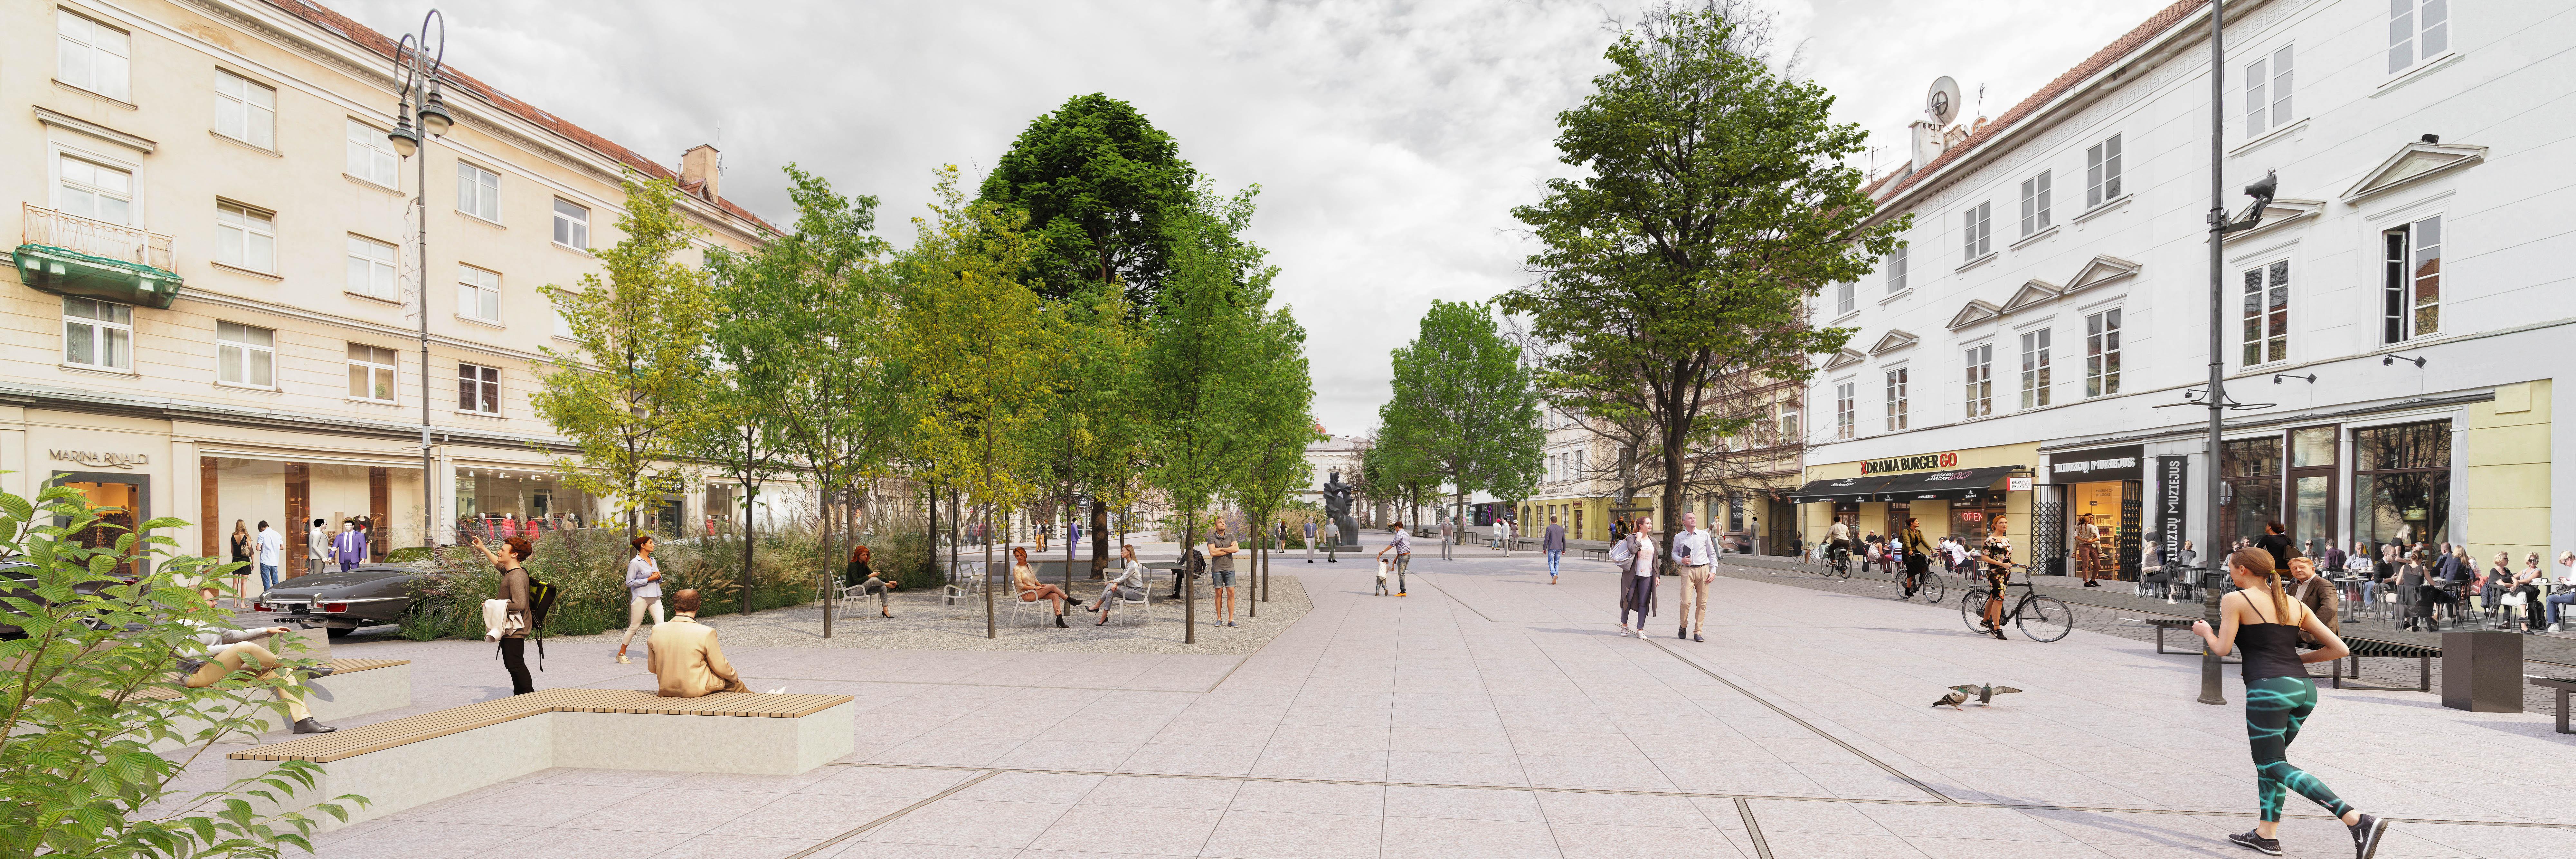 "1 vieta ""Strassen-Platz"" | Vilniaus miesto savivaldybės nuotr."